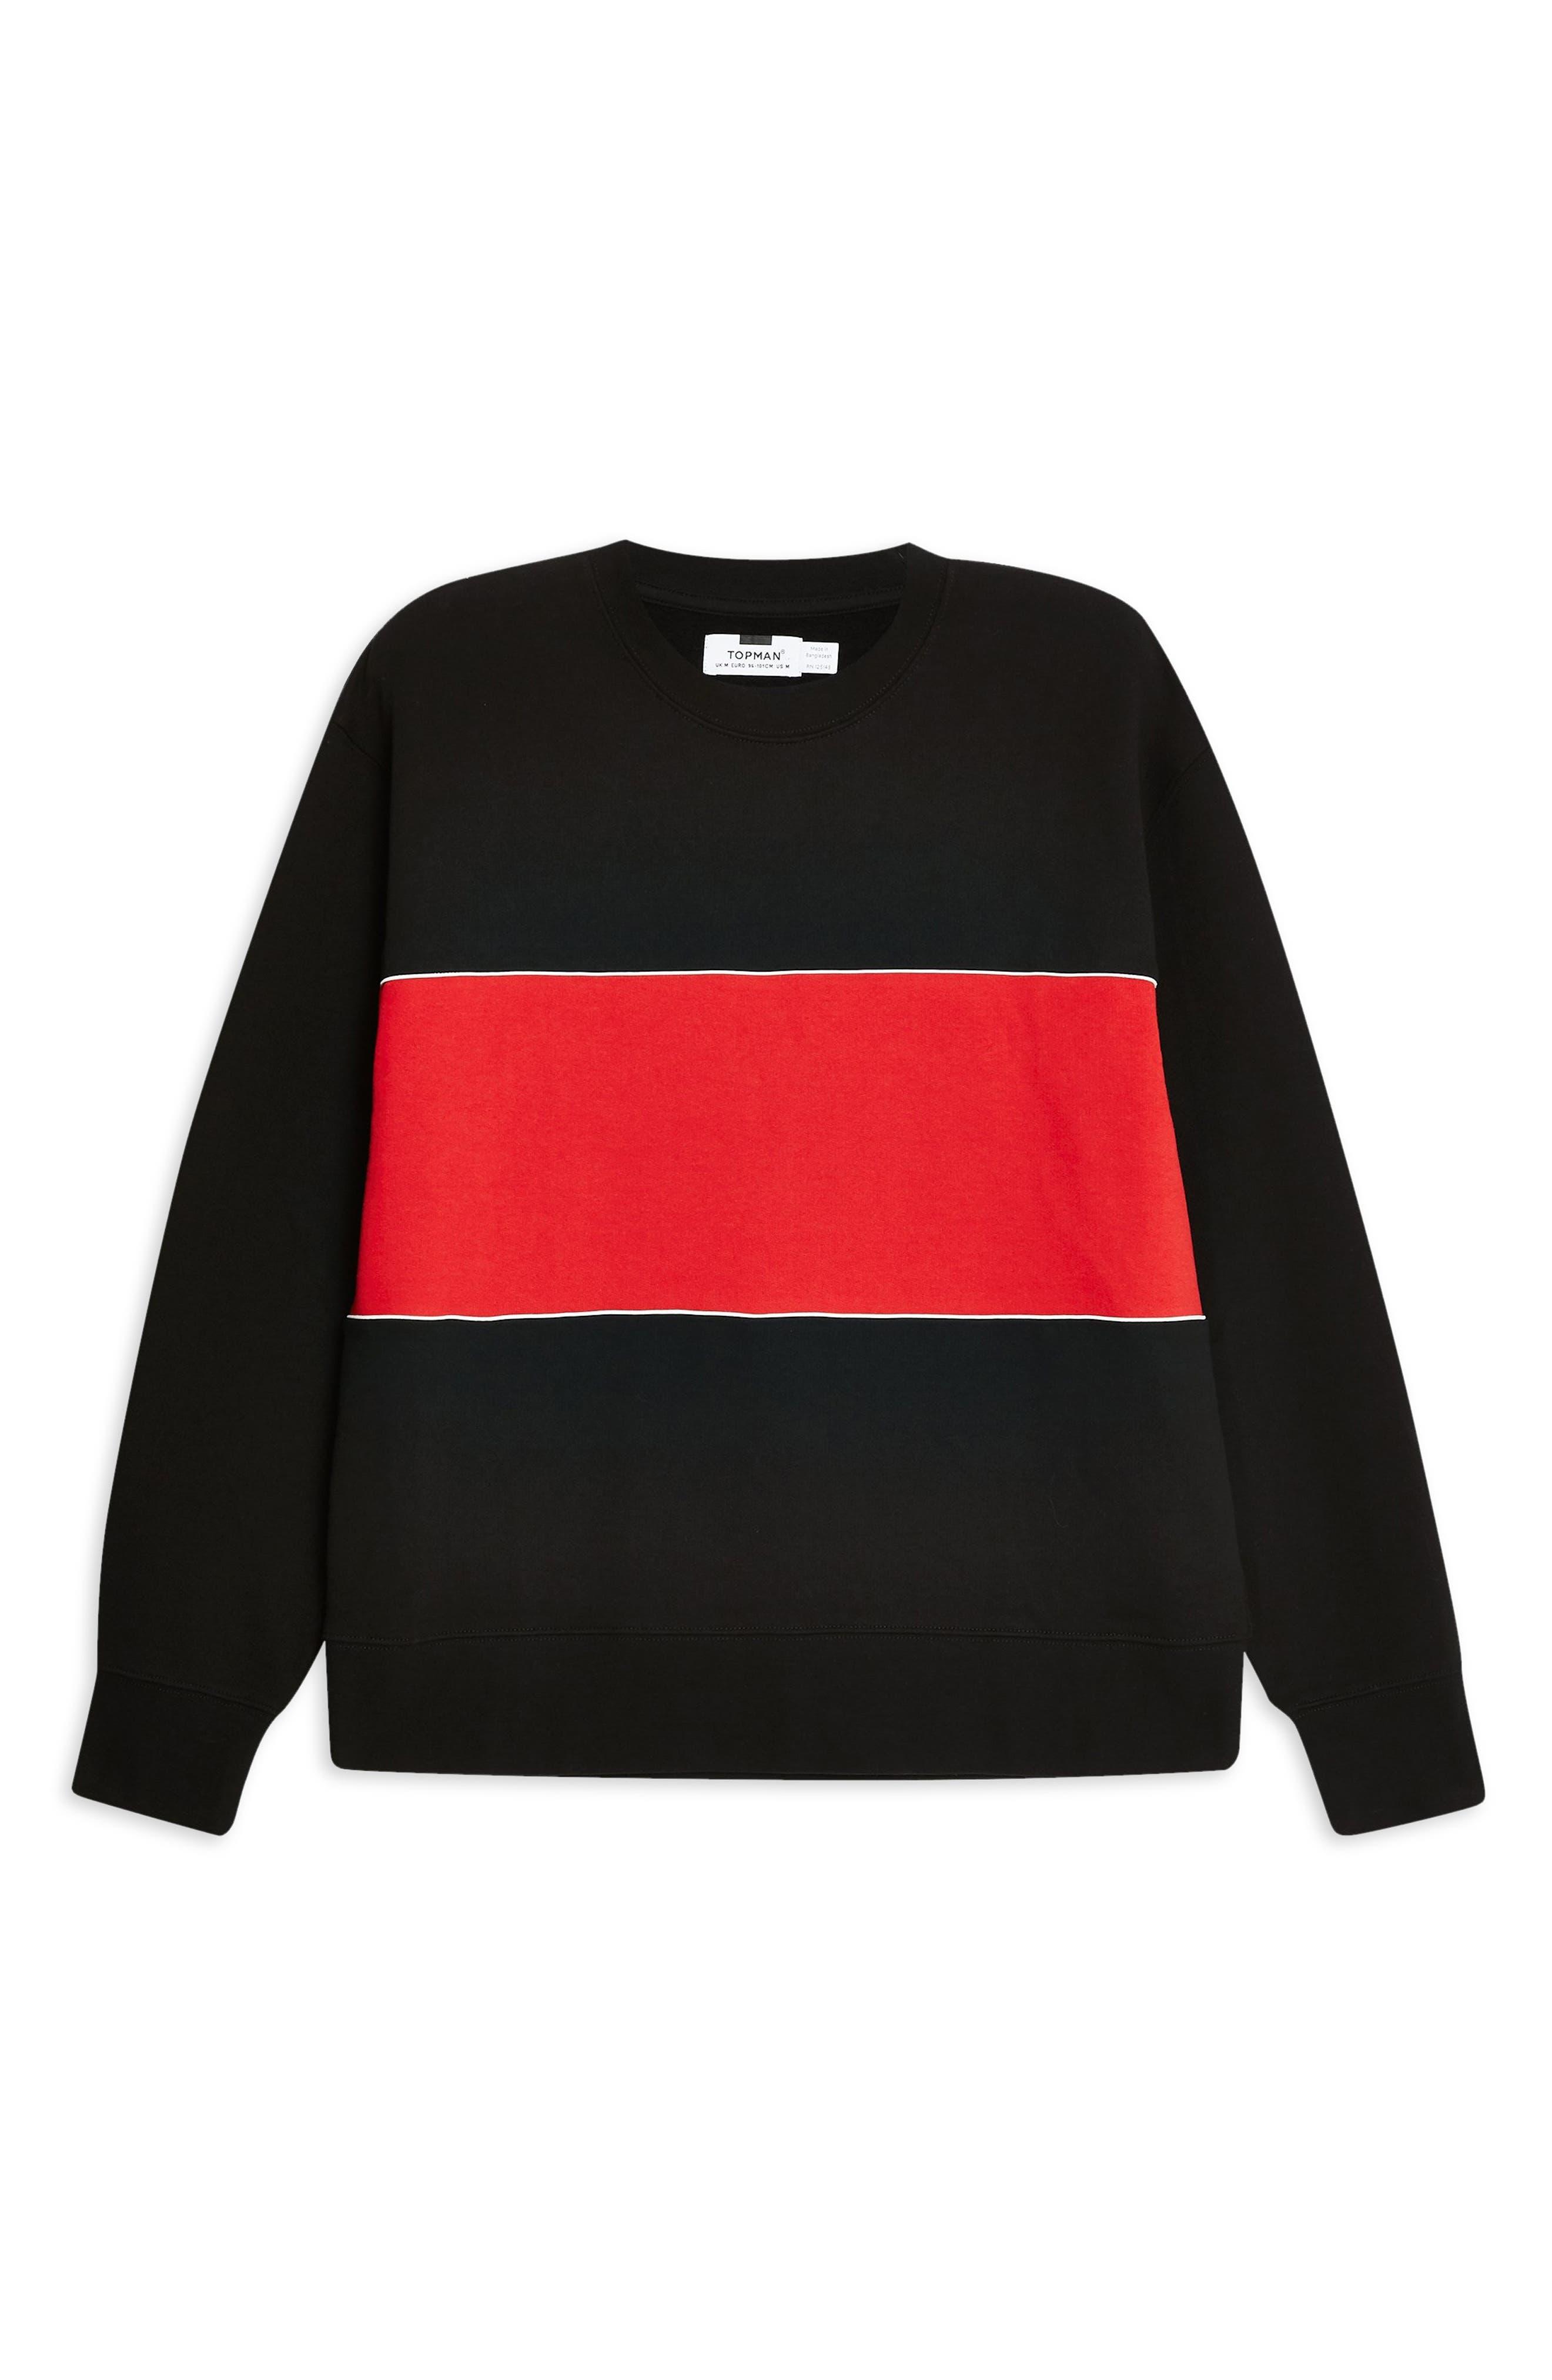 TOPMAN, Colorblock Longline Crewneck Sweatshirt, Alternate thumbnail 5, color, BLACK